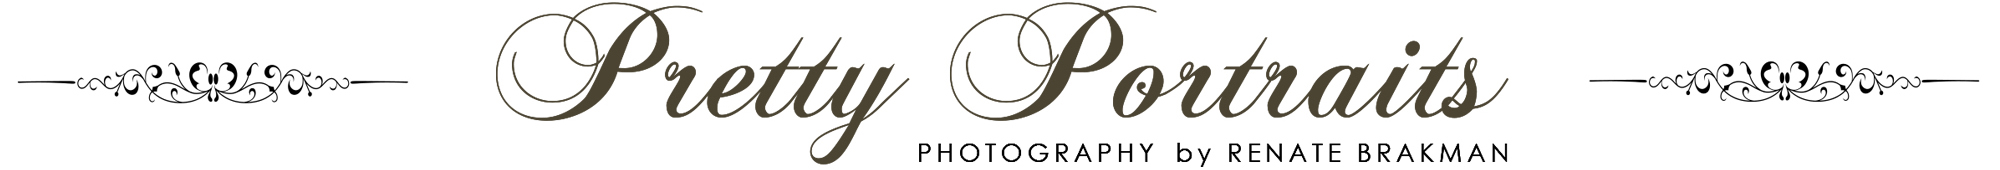 Fotostudio Pretty Portraits: Portretten - Familie - Bruiloften